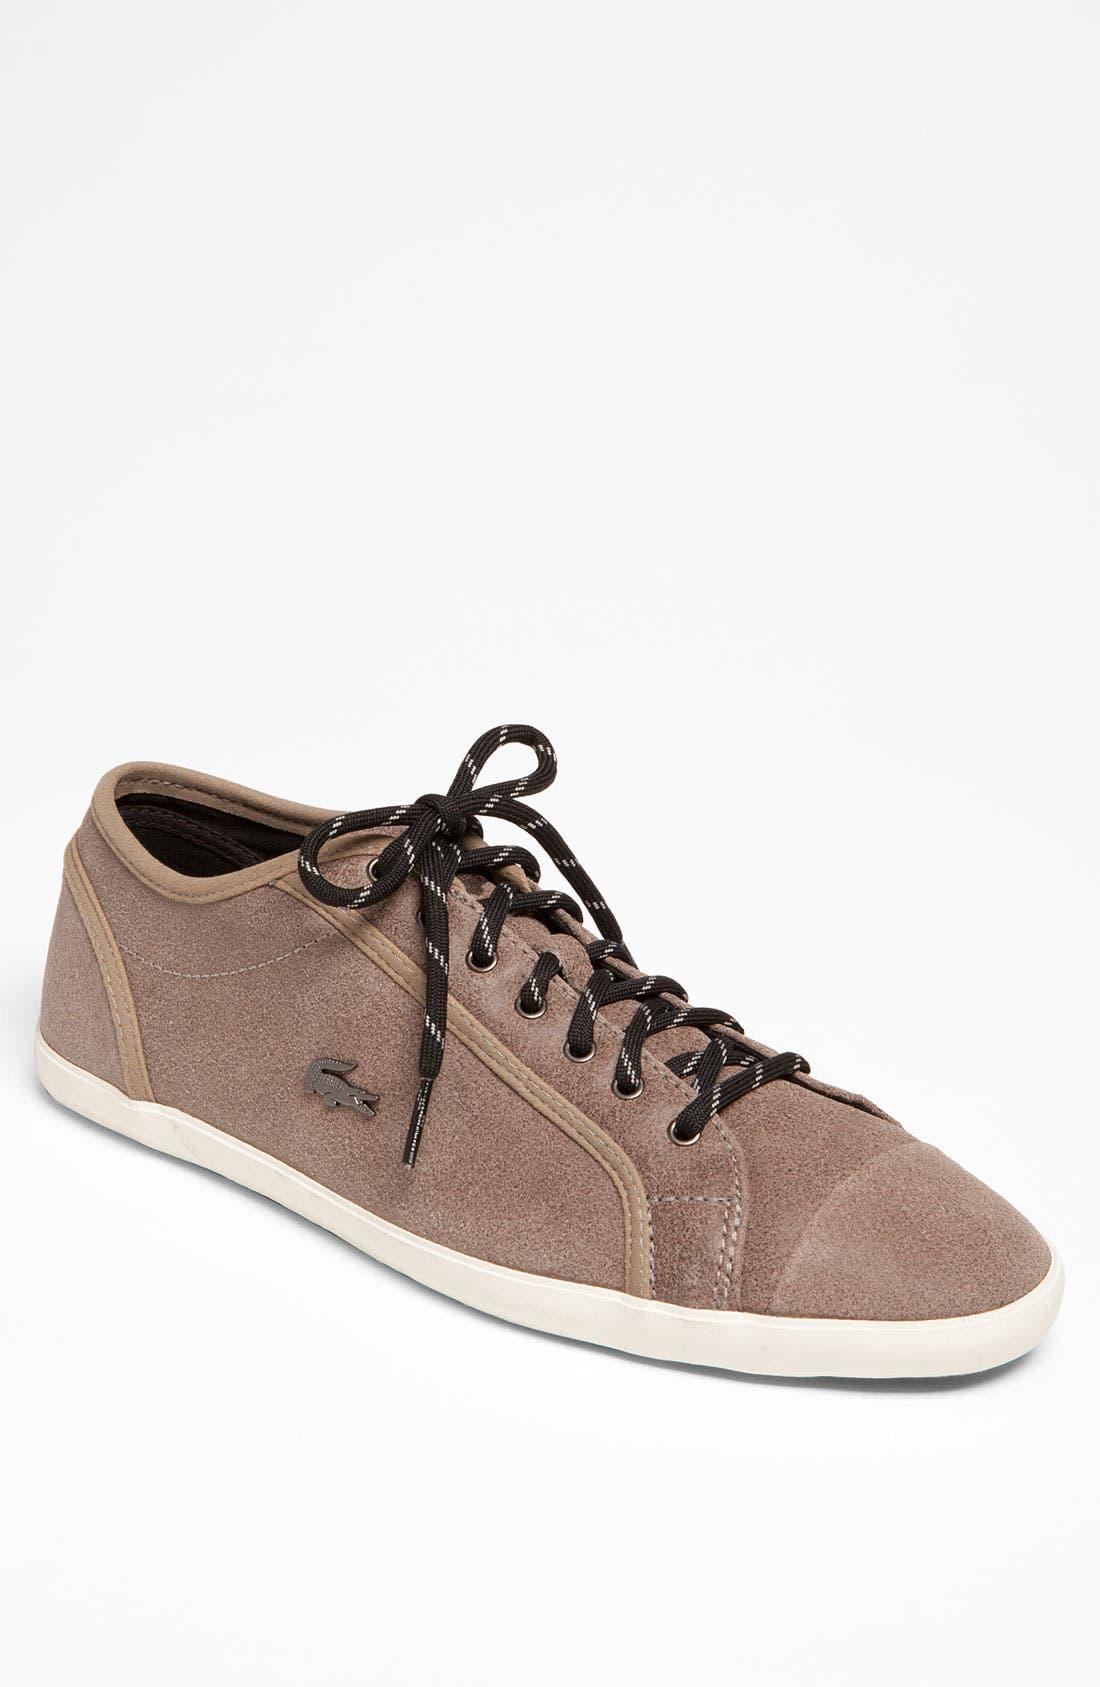 Alternate Image 1 Selected - Lacoste 'Berber 6' Sneaker